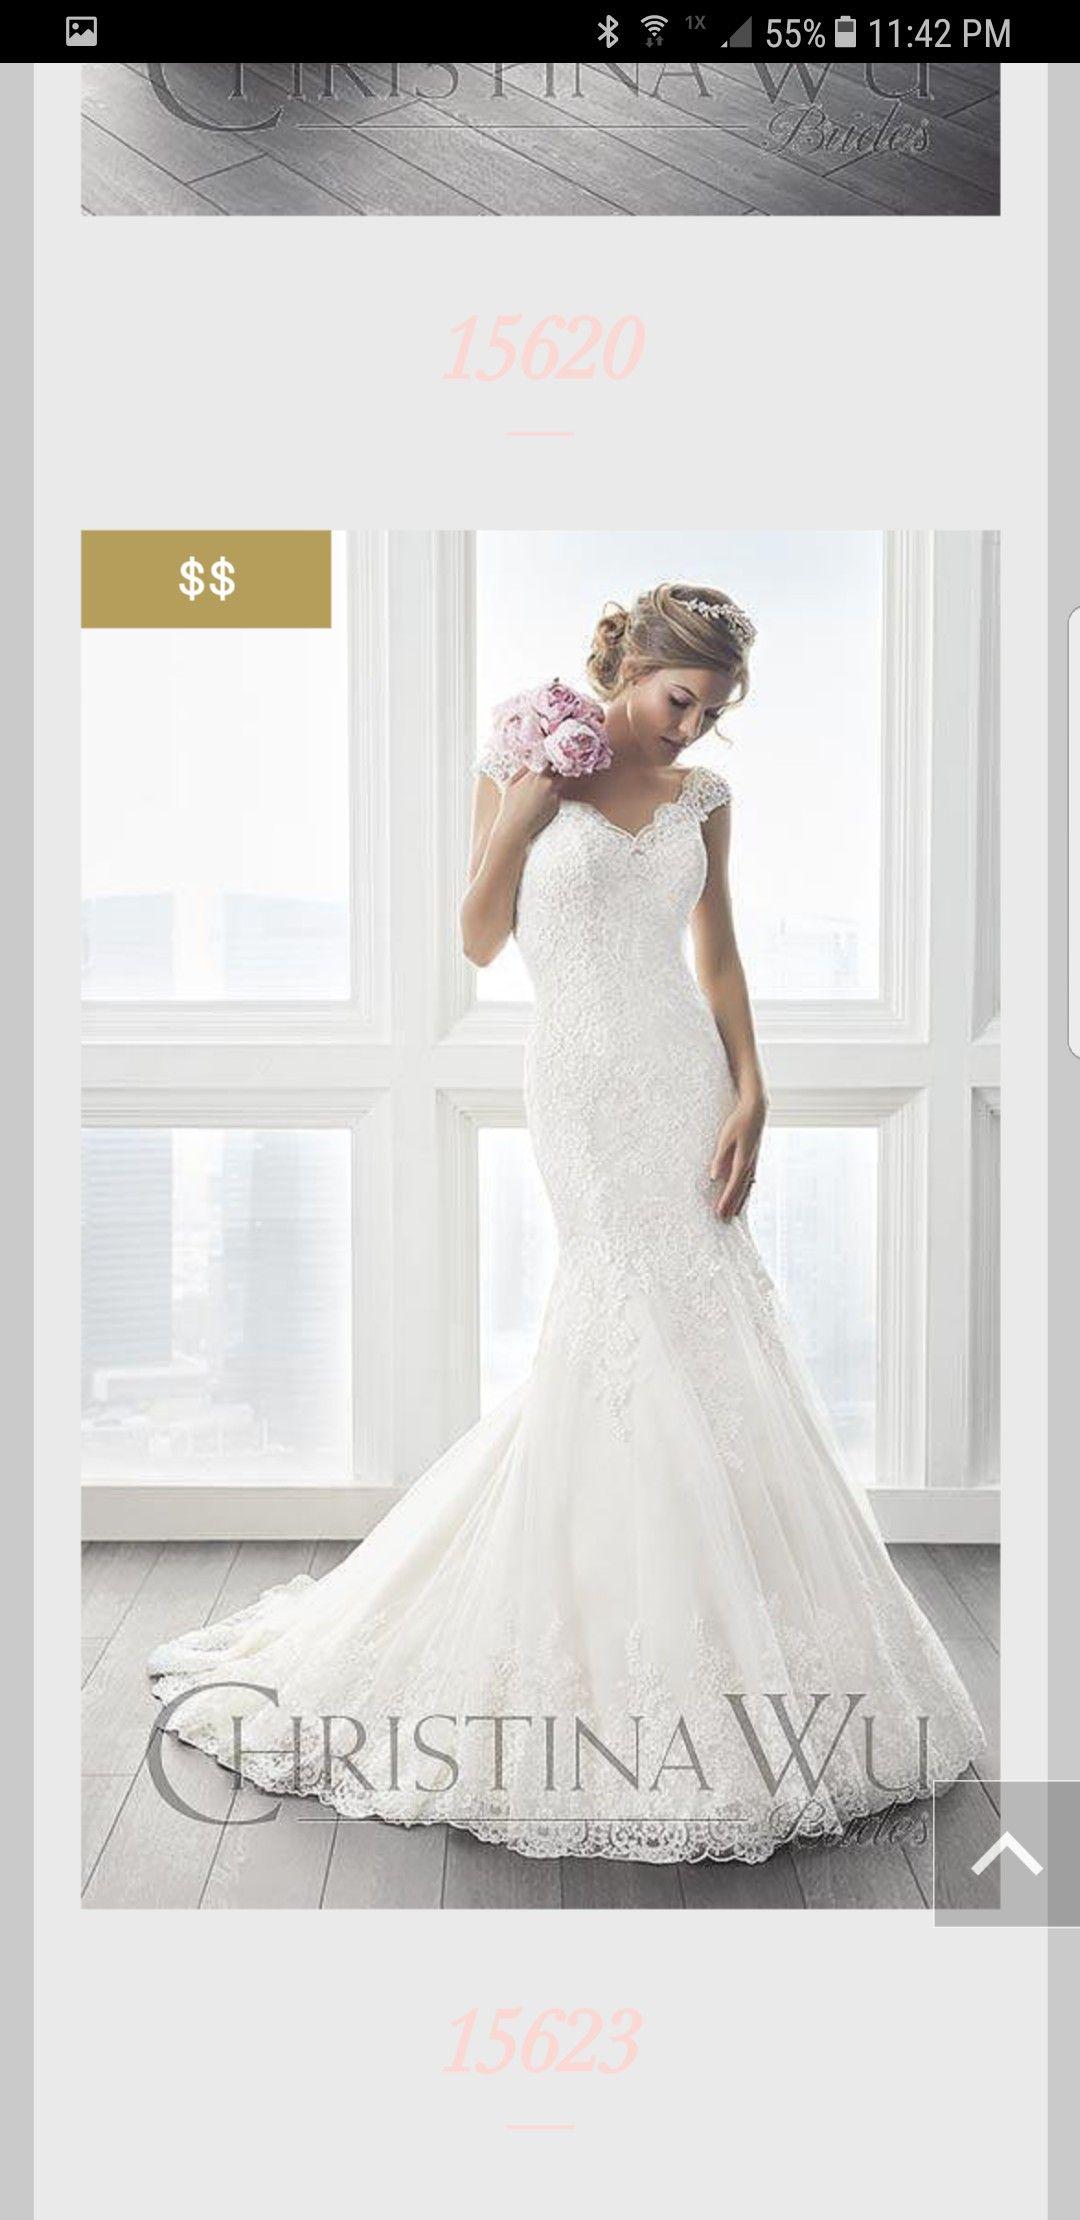 Pin by erica philman on wedding gown ideas pinterest weddings